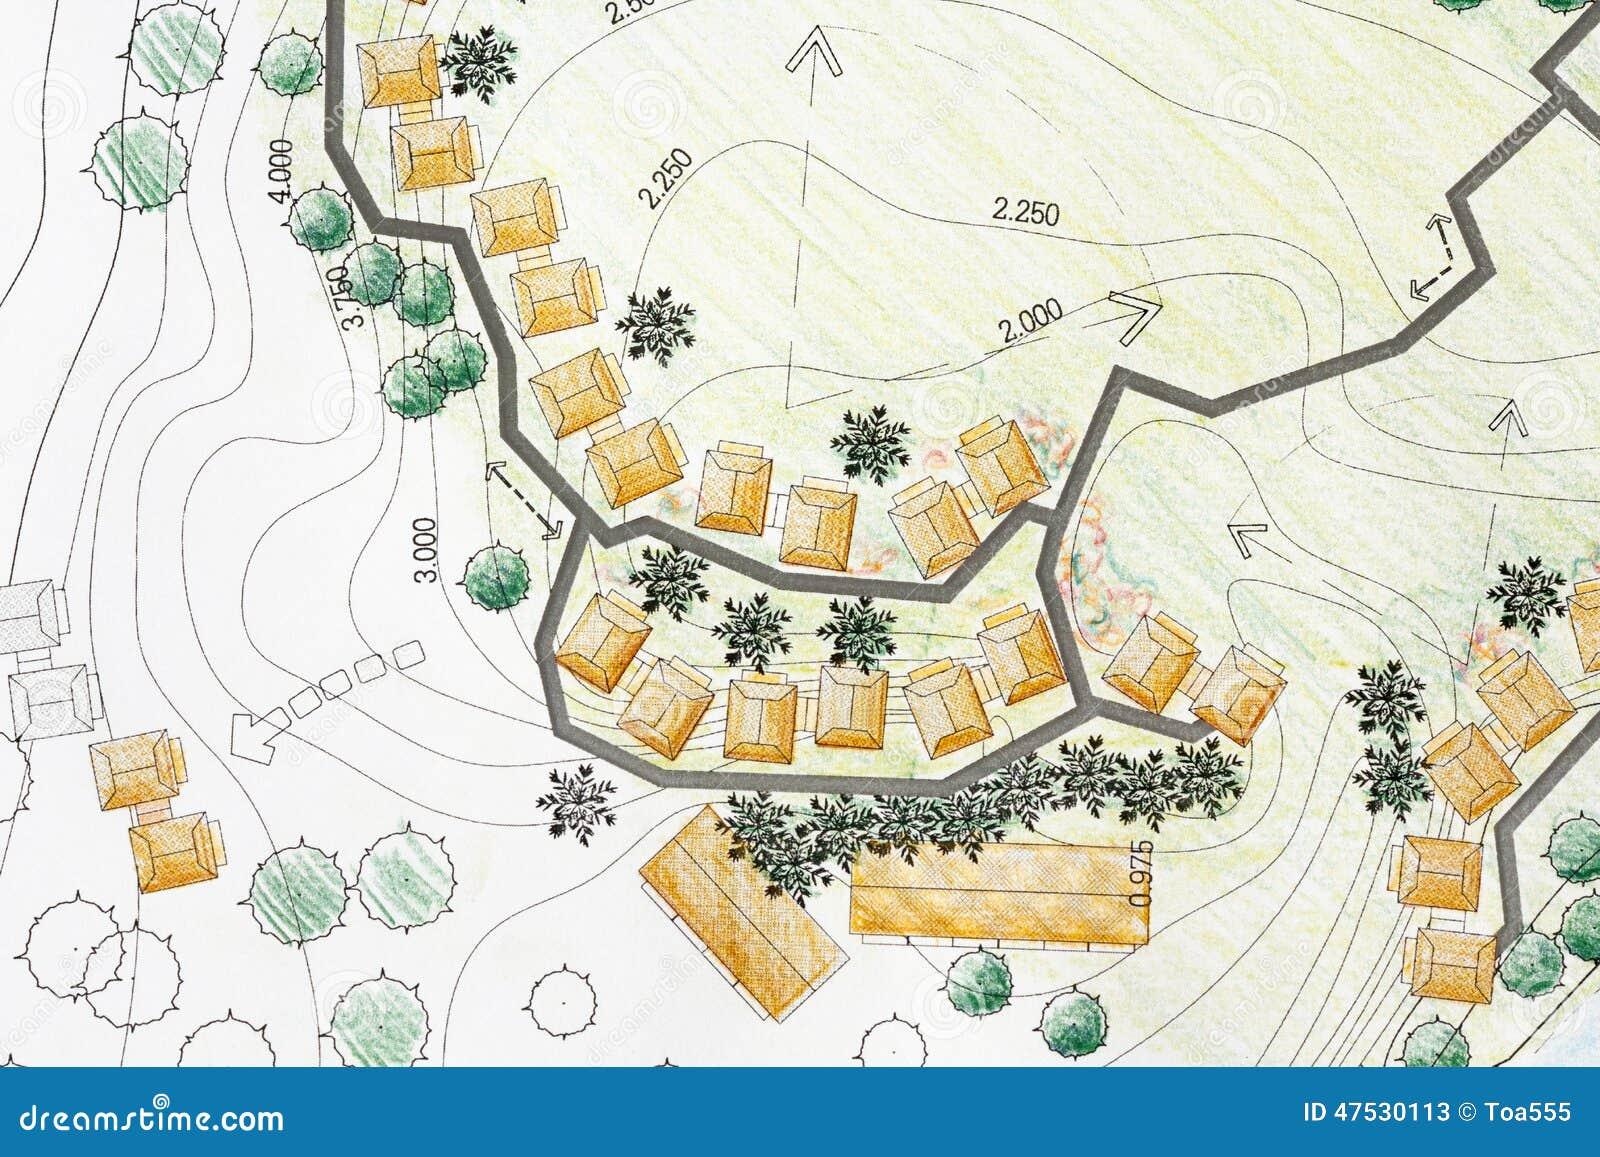 Landscape Architect Designing On Site Analysis Plan Stock Image